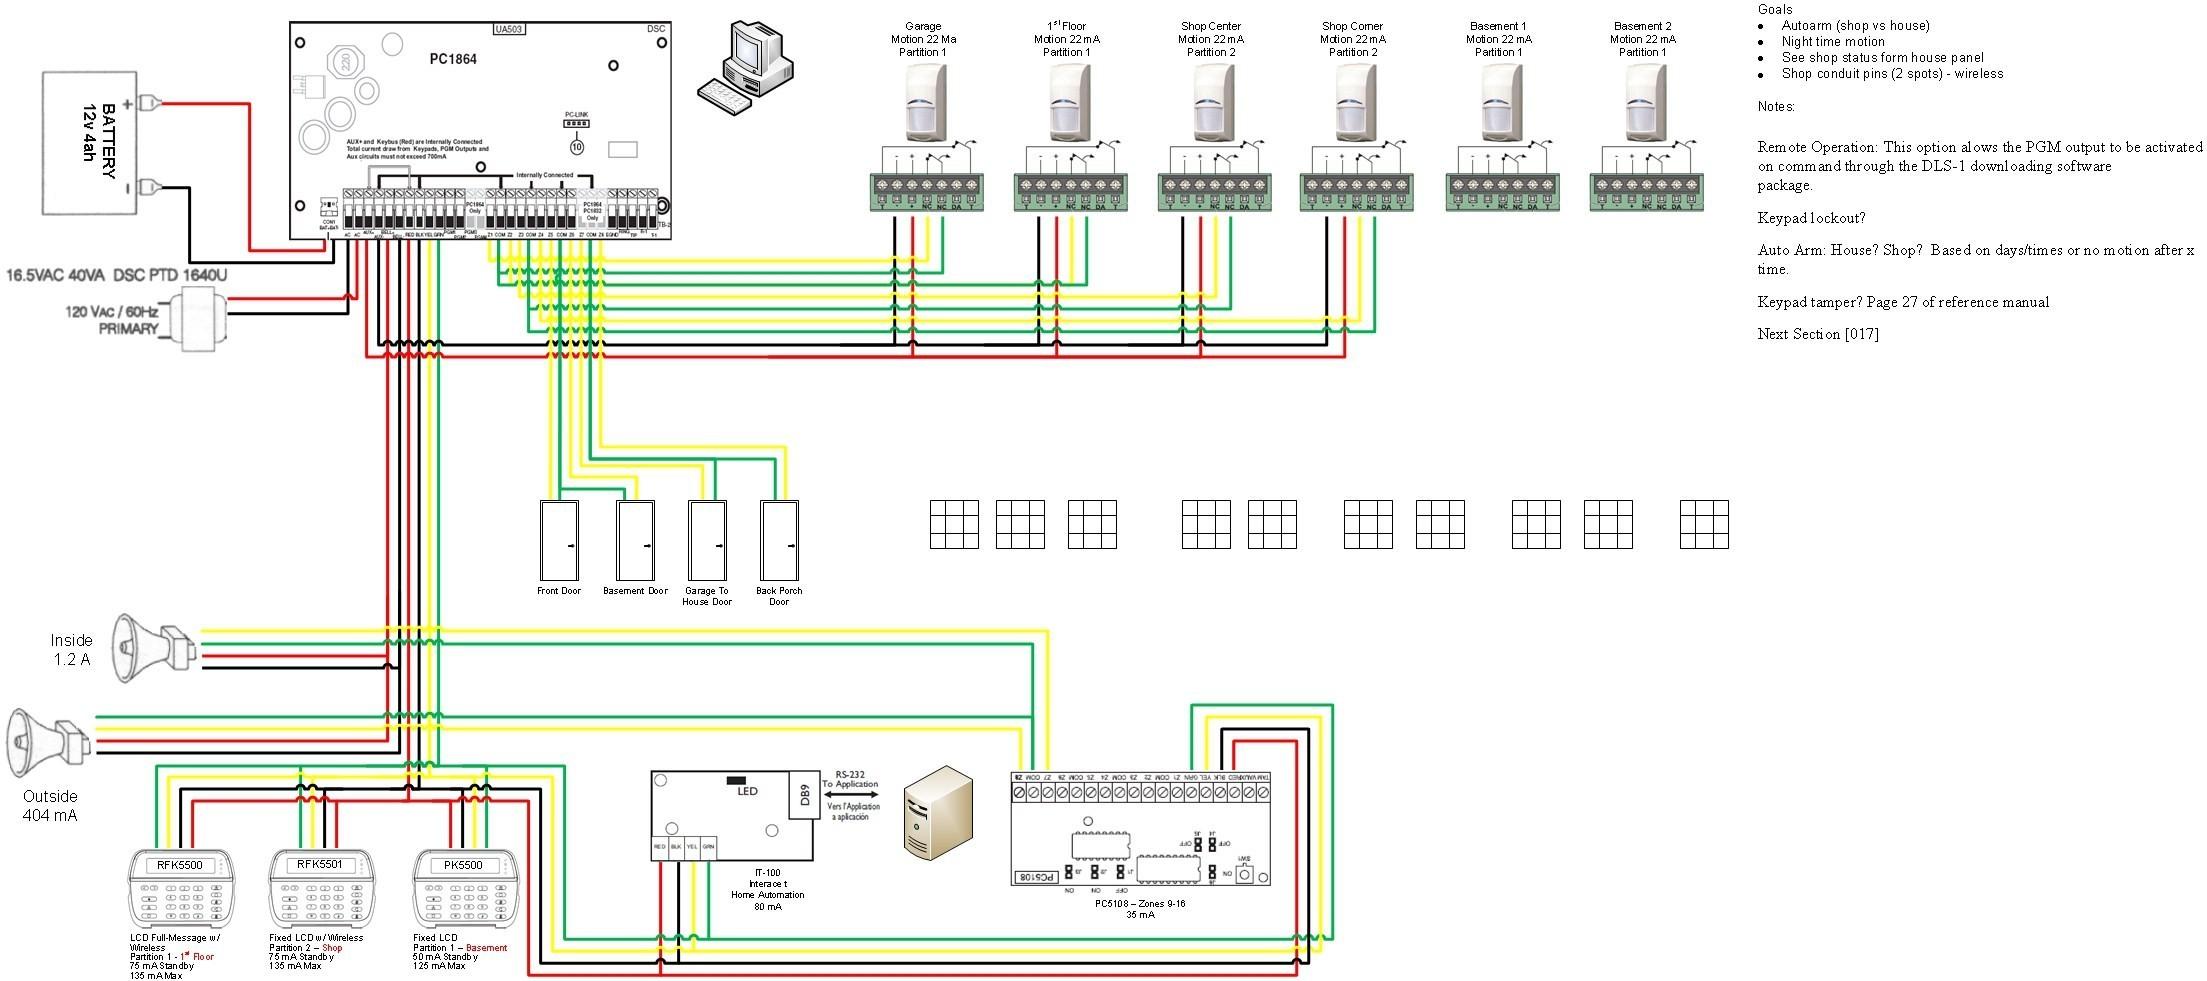 Car Alarm System Wiring Diagram Dsc Alarm Wiring Diagram Wiring Diagram Of Car Alarm System Wiring Diagram